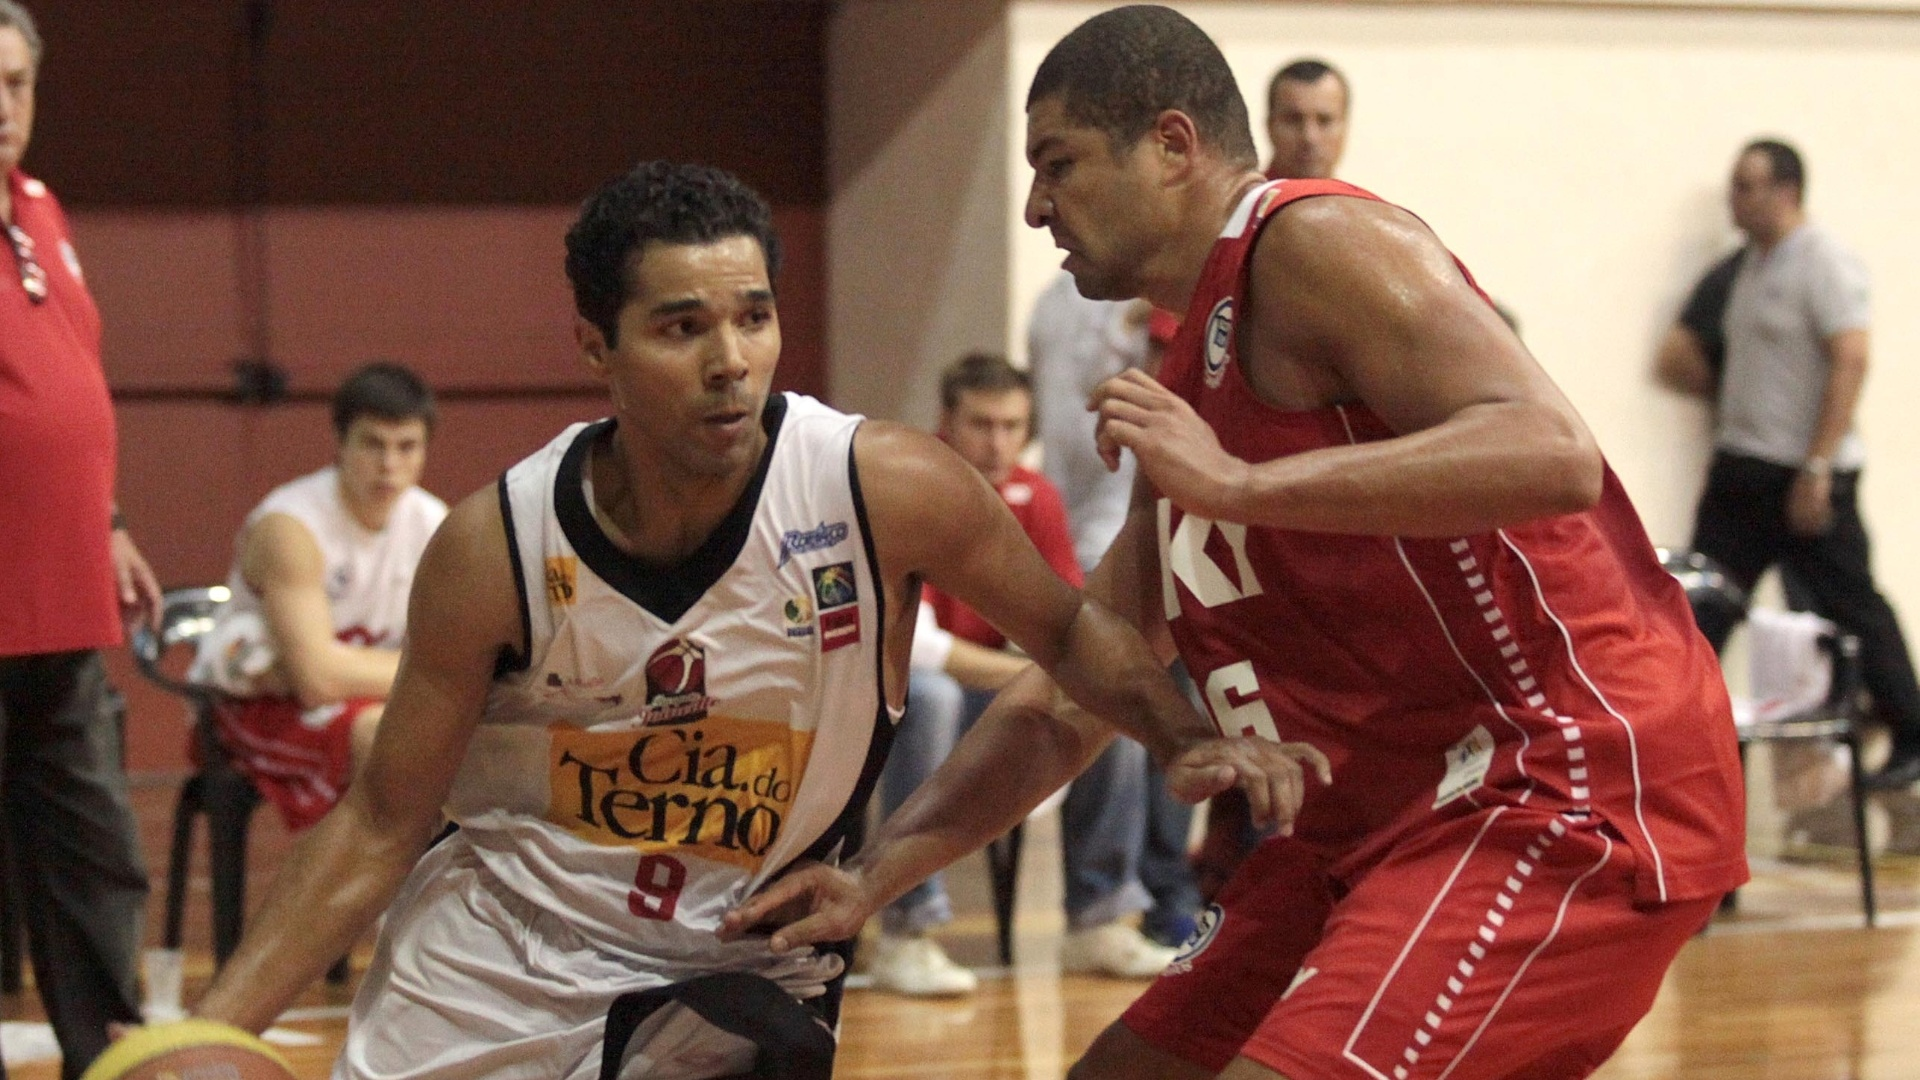 Luiz Felipe, de Joinville, tenta passar por Olivinha, do Pinheiros